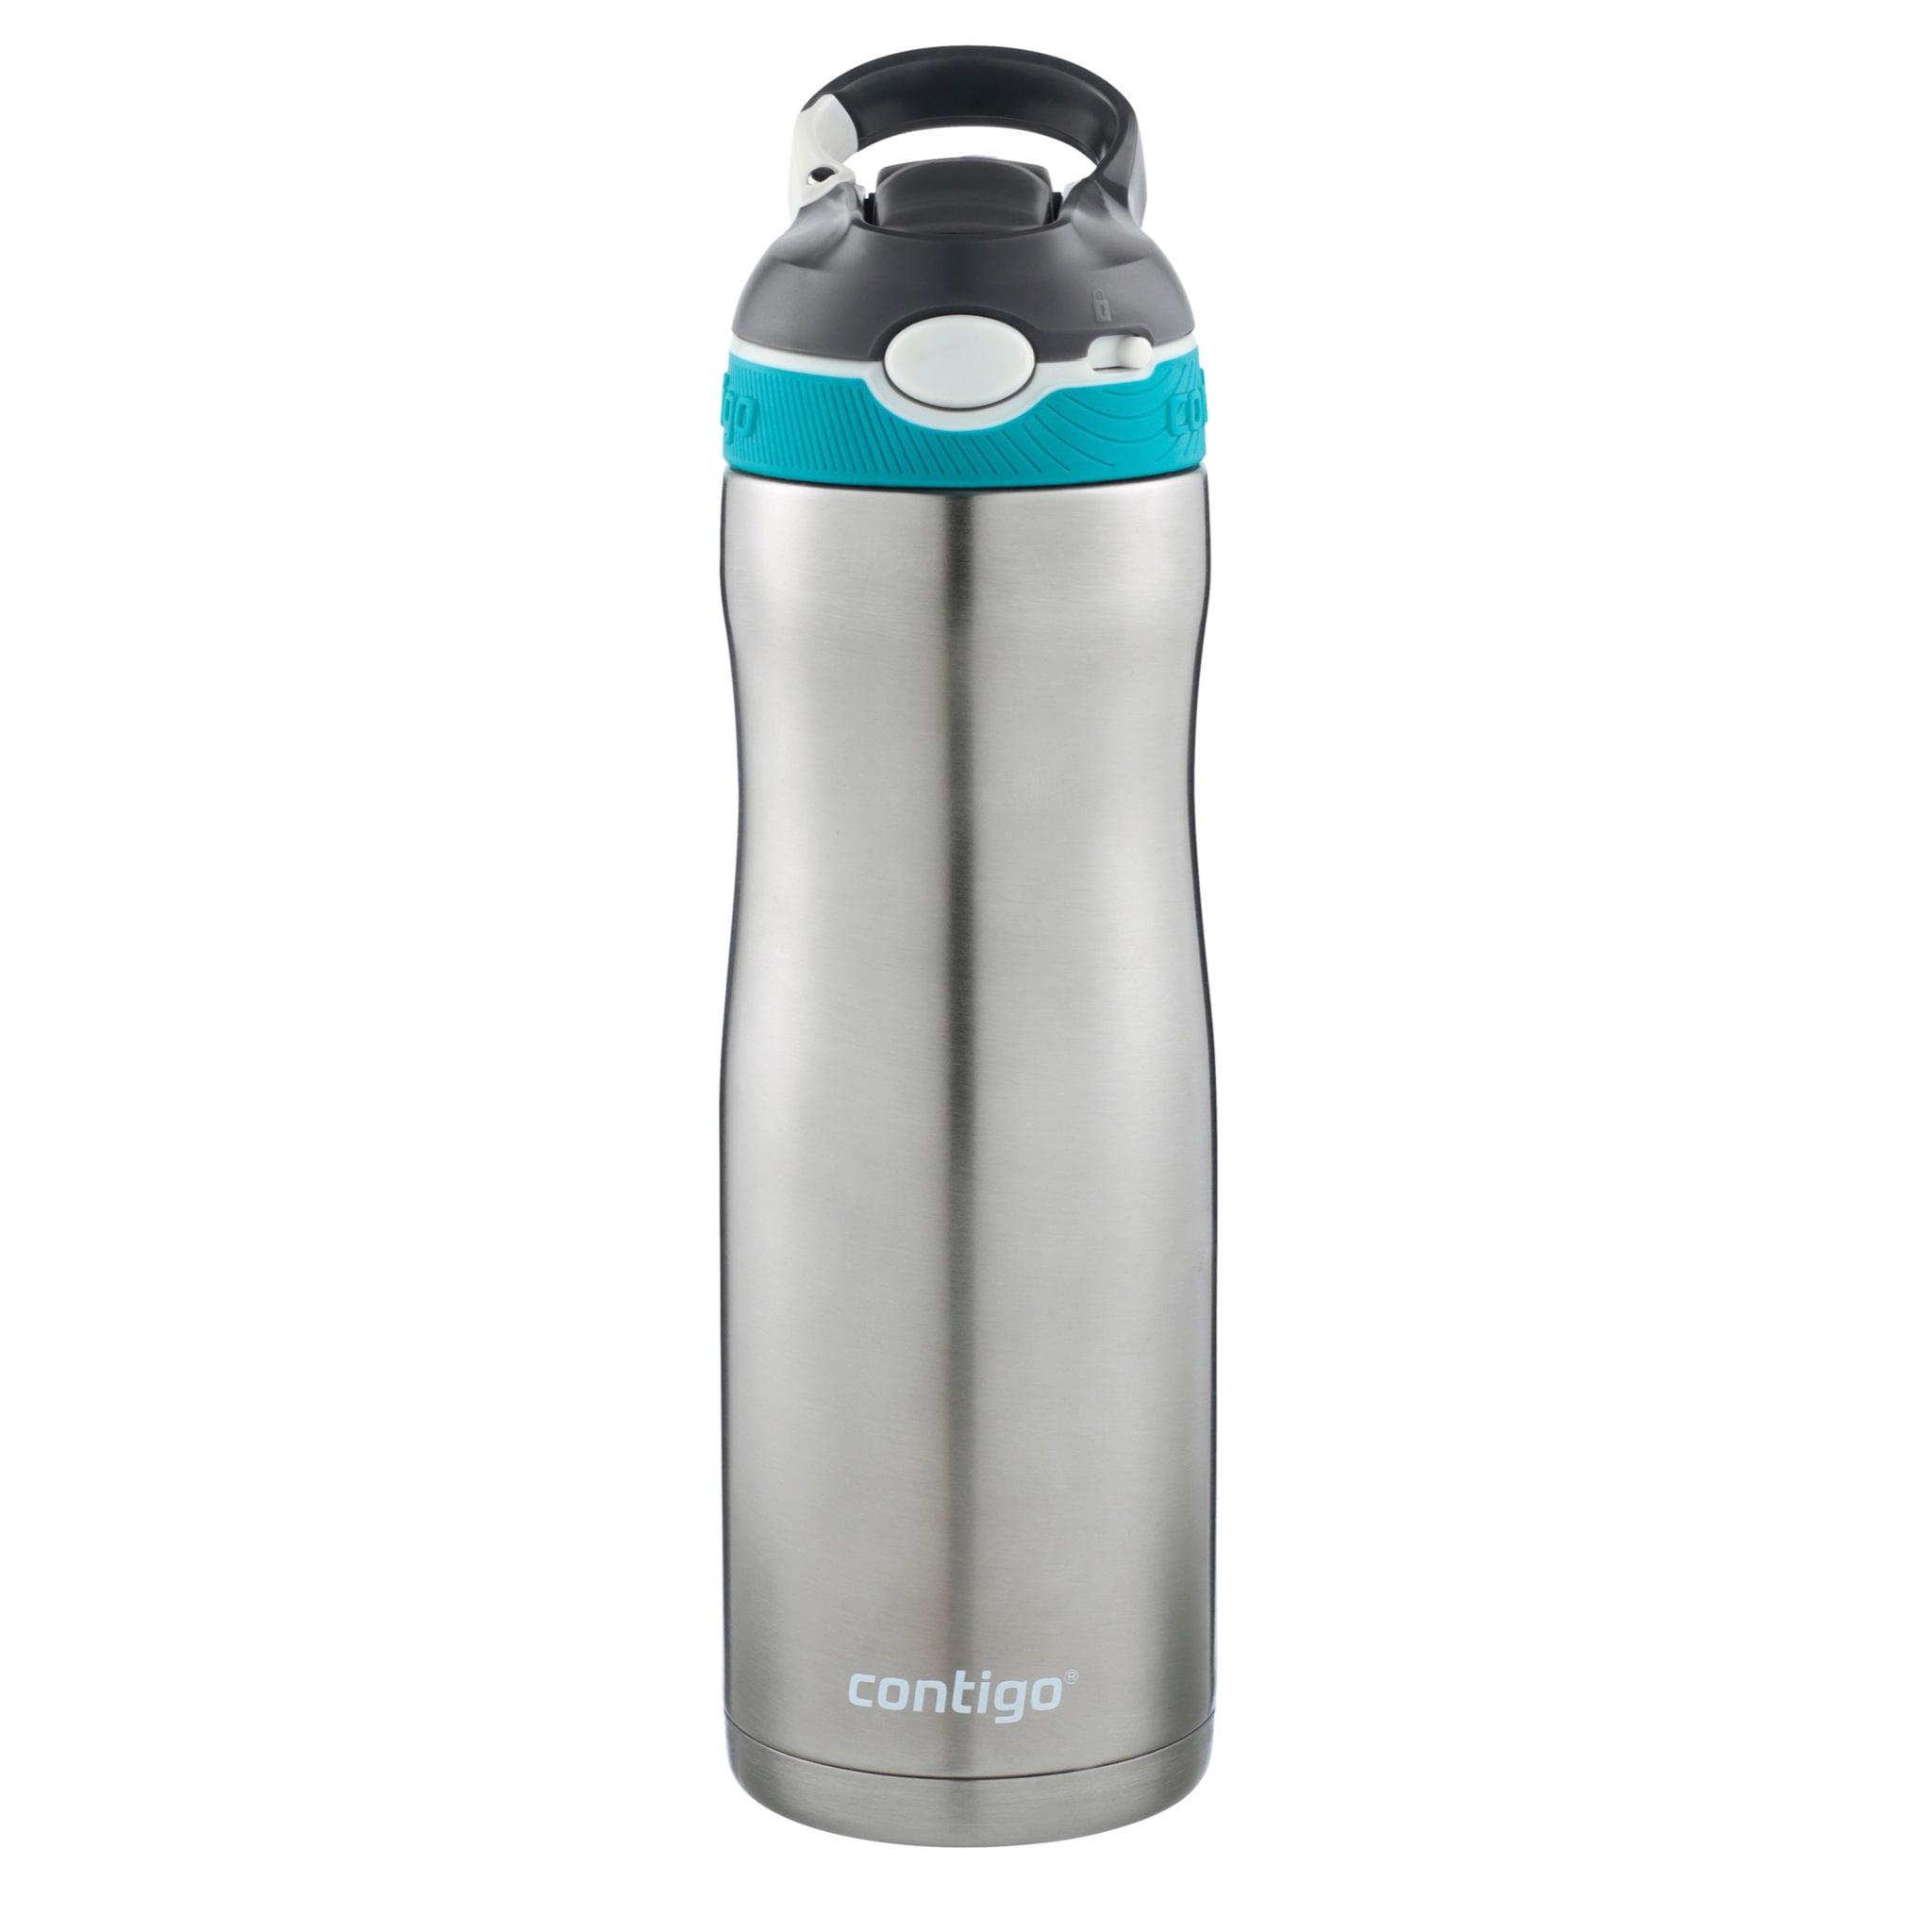 Contigo AUTOSPOUT Straw Ashland Chill Stainless Steel Water Bottle, 20 oz., SS Scuba